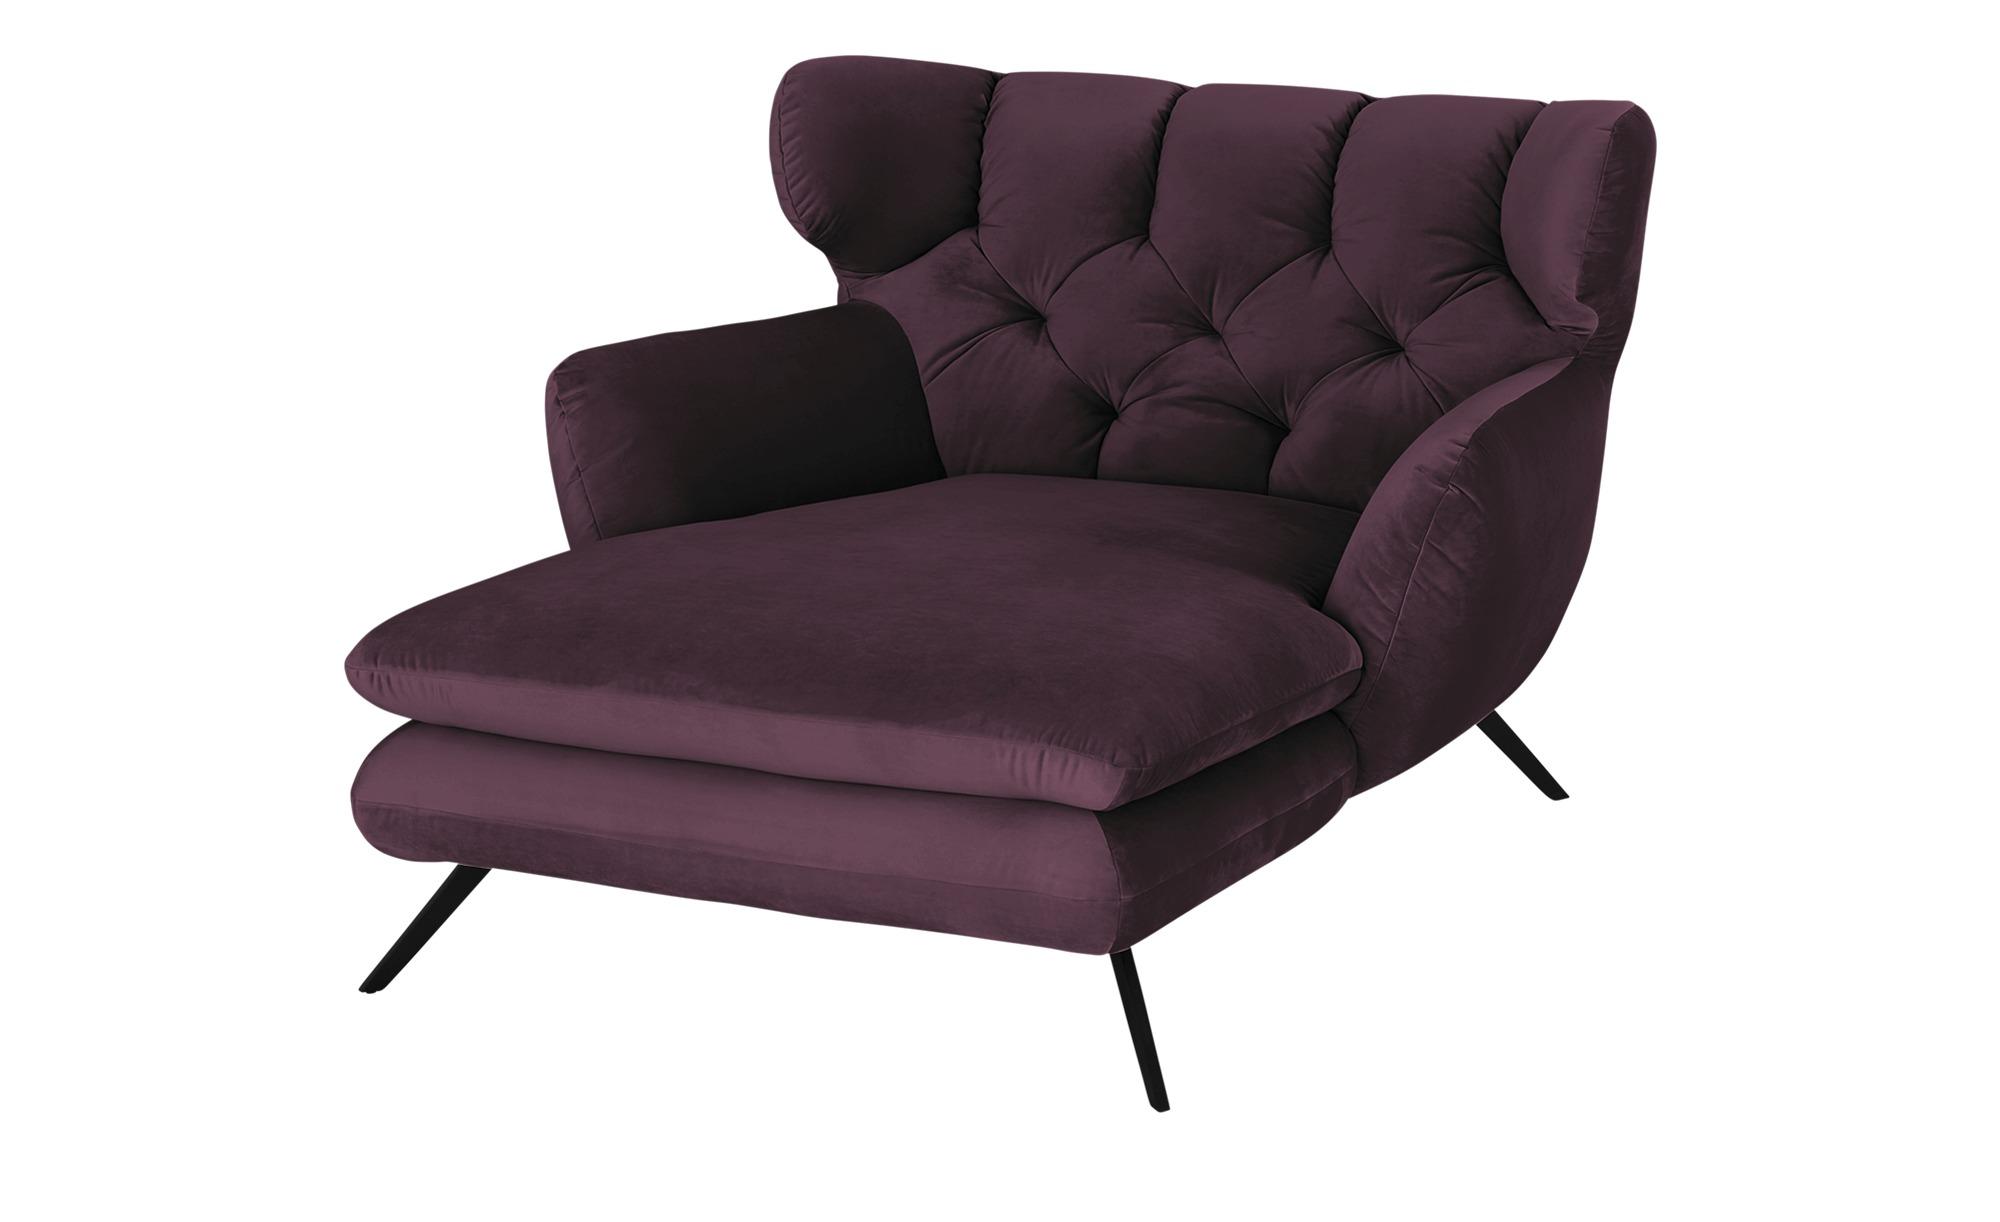 pop Longseat-Sessel  Caldara ¦ lila/violett ¦ Maße (cm): B: 126 H: 94 T: 160 Polstermöbel > Sessel > Ohrensessel - Höffner